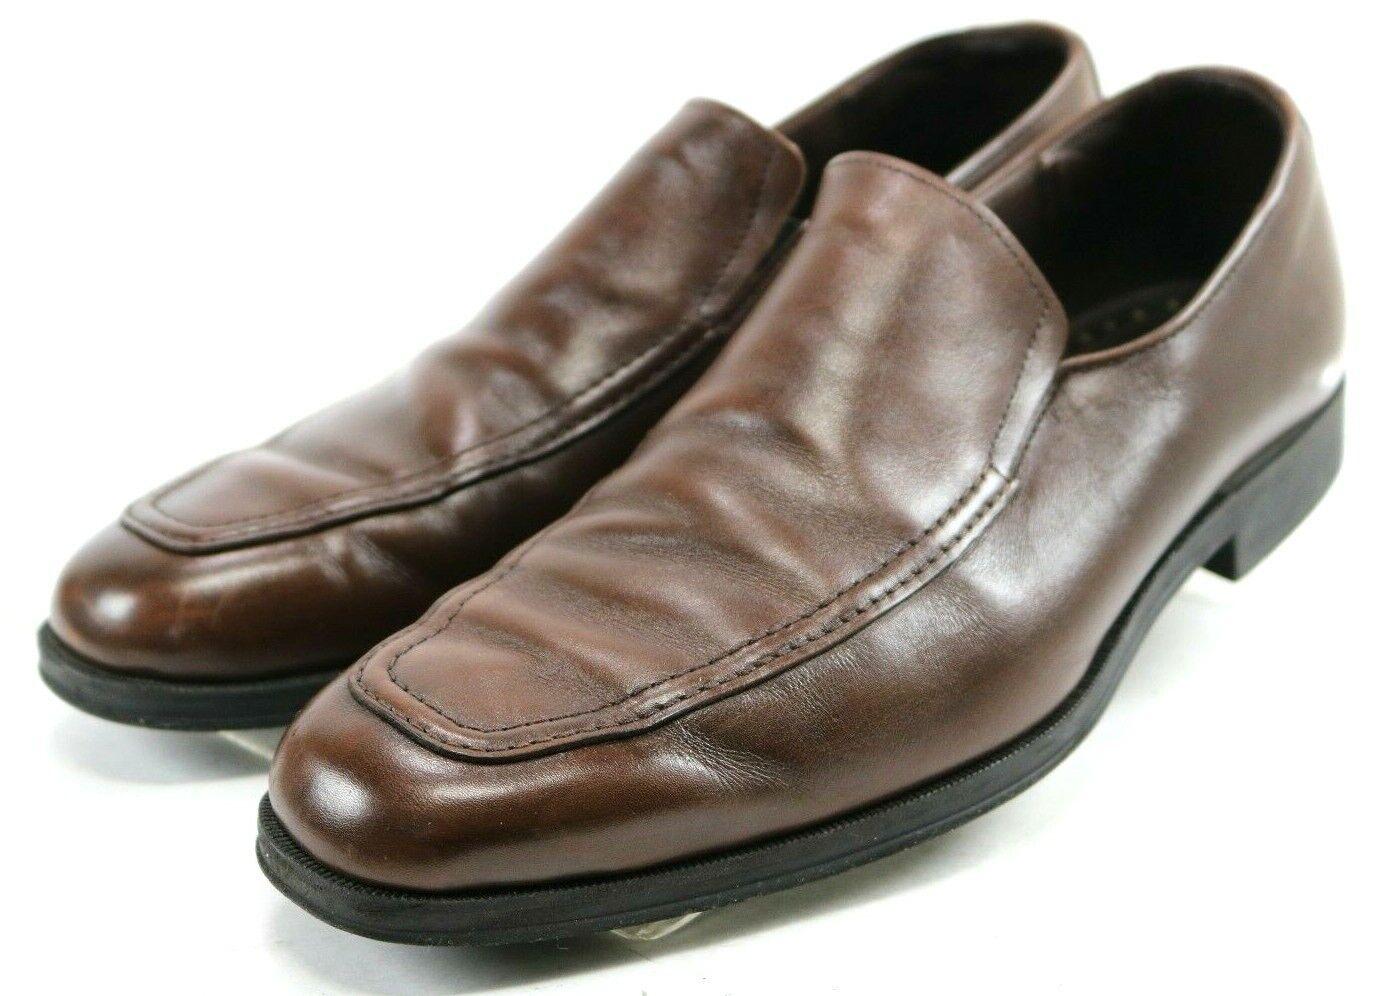 Allen Edmonds Bucktown  150 Men's Dress Loafers Size 8 Leather Bown